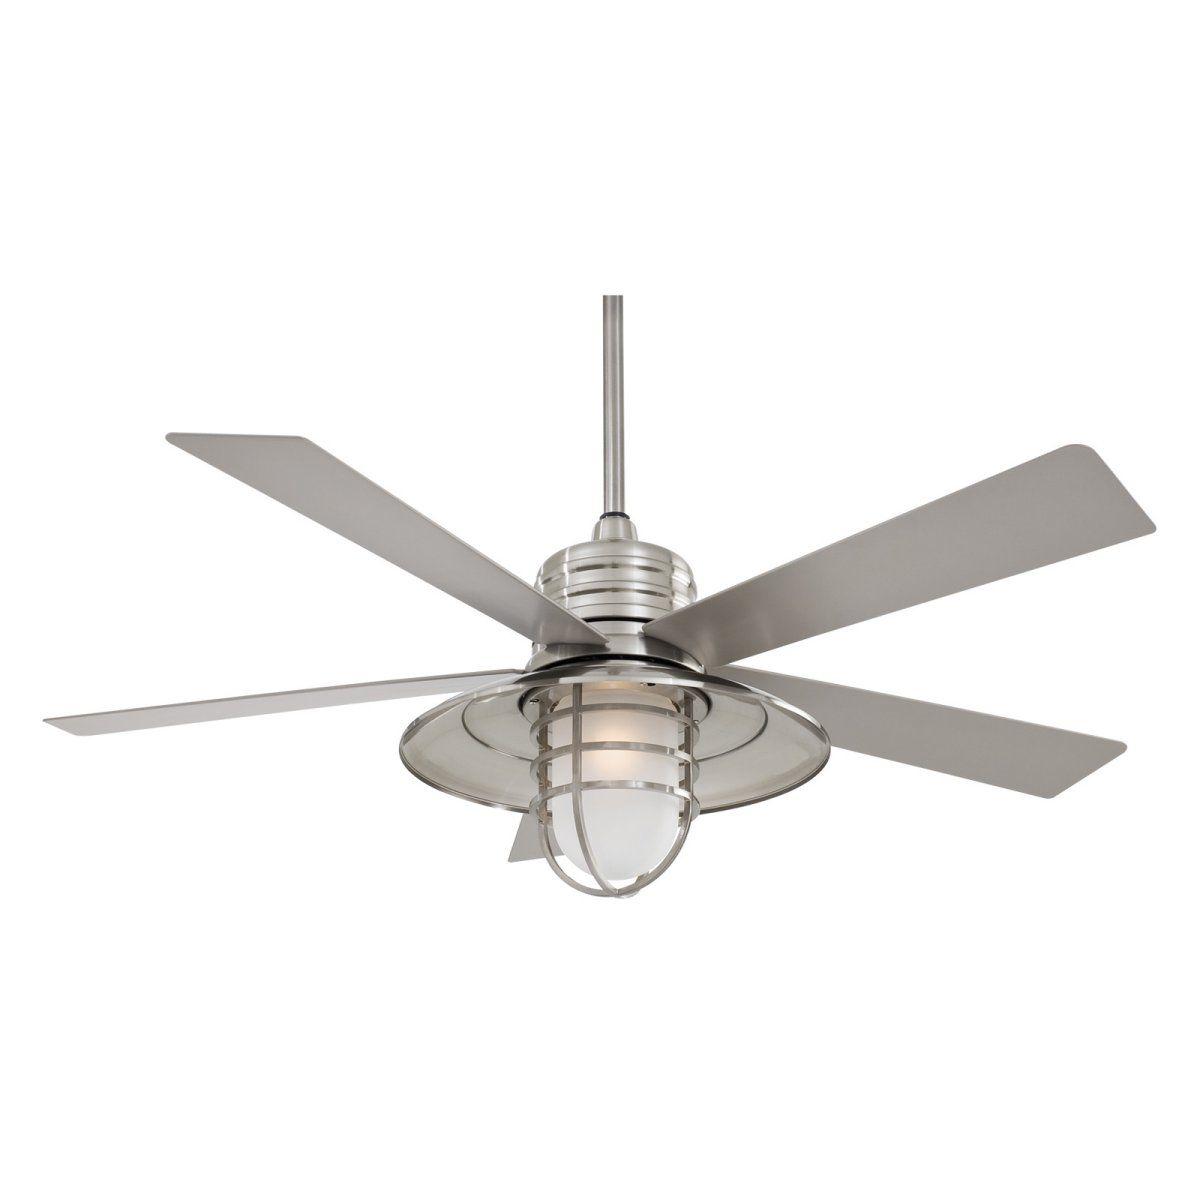 Minka Aire F582-BNW Rainman 54 in. Outdoor Ceiling Fan - Brushed ...